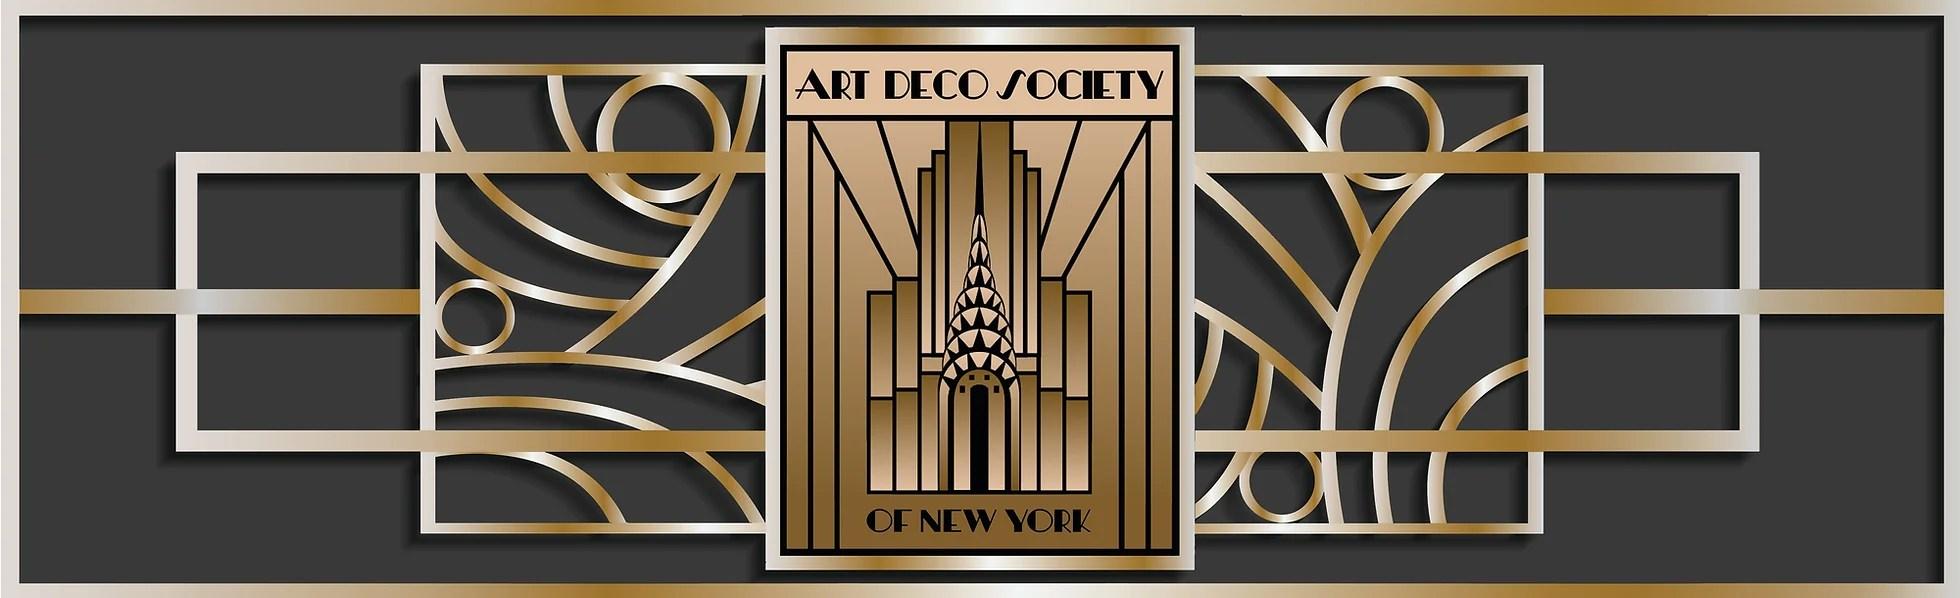 art deco society of new york artdeco org